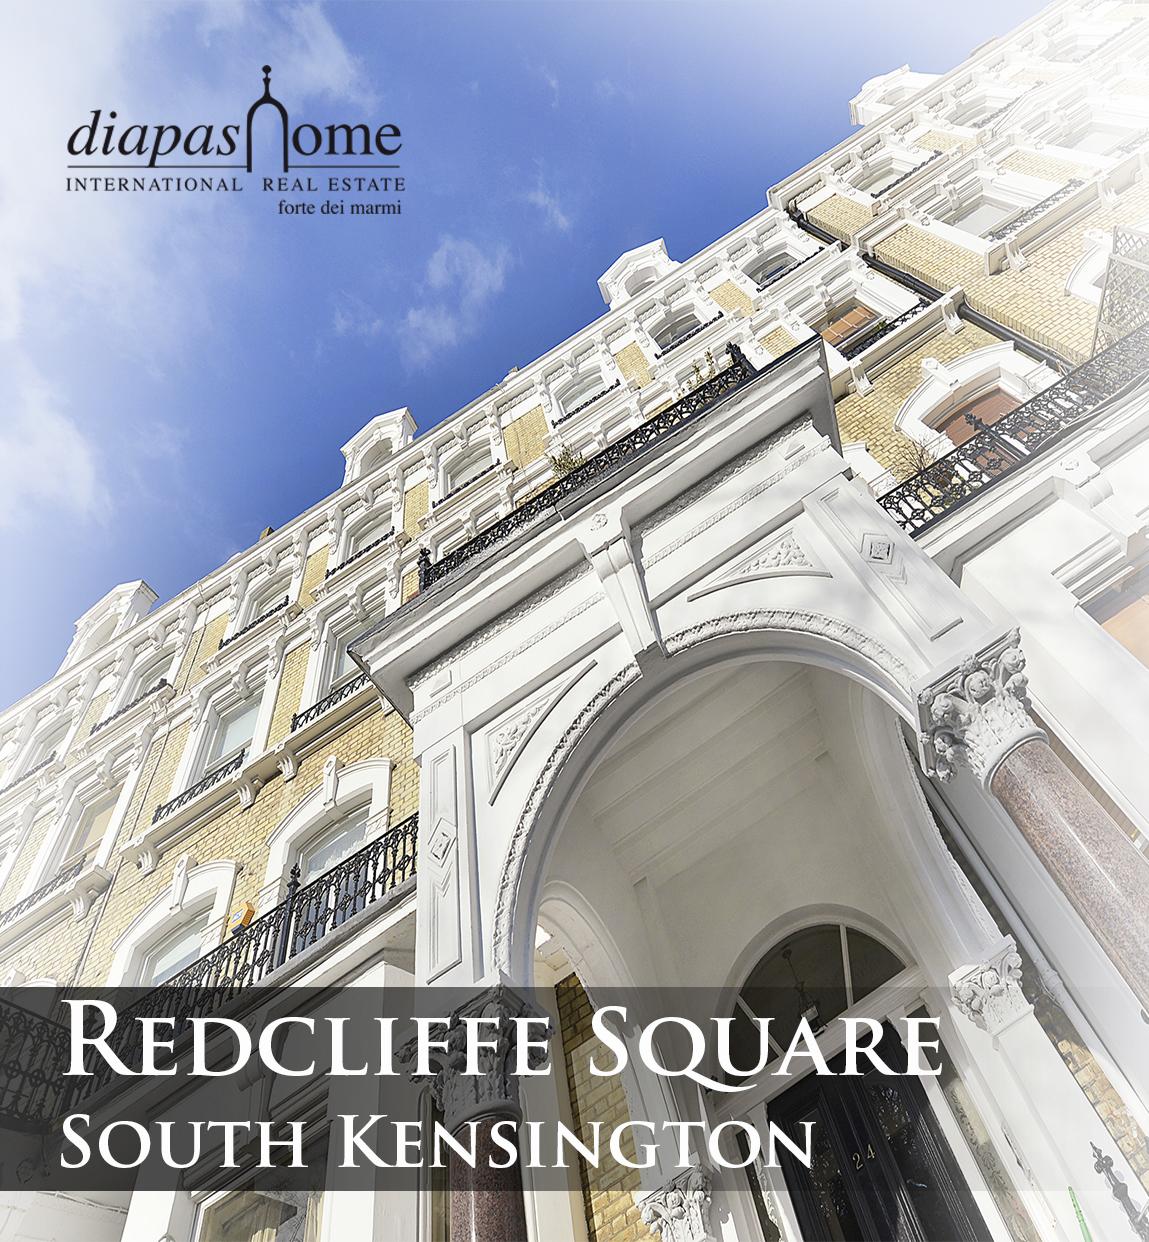 Kensington Station Apartments: Redcliffe Square, South Kensington